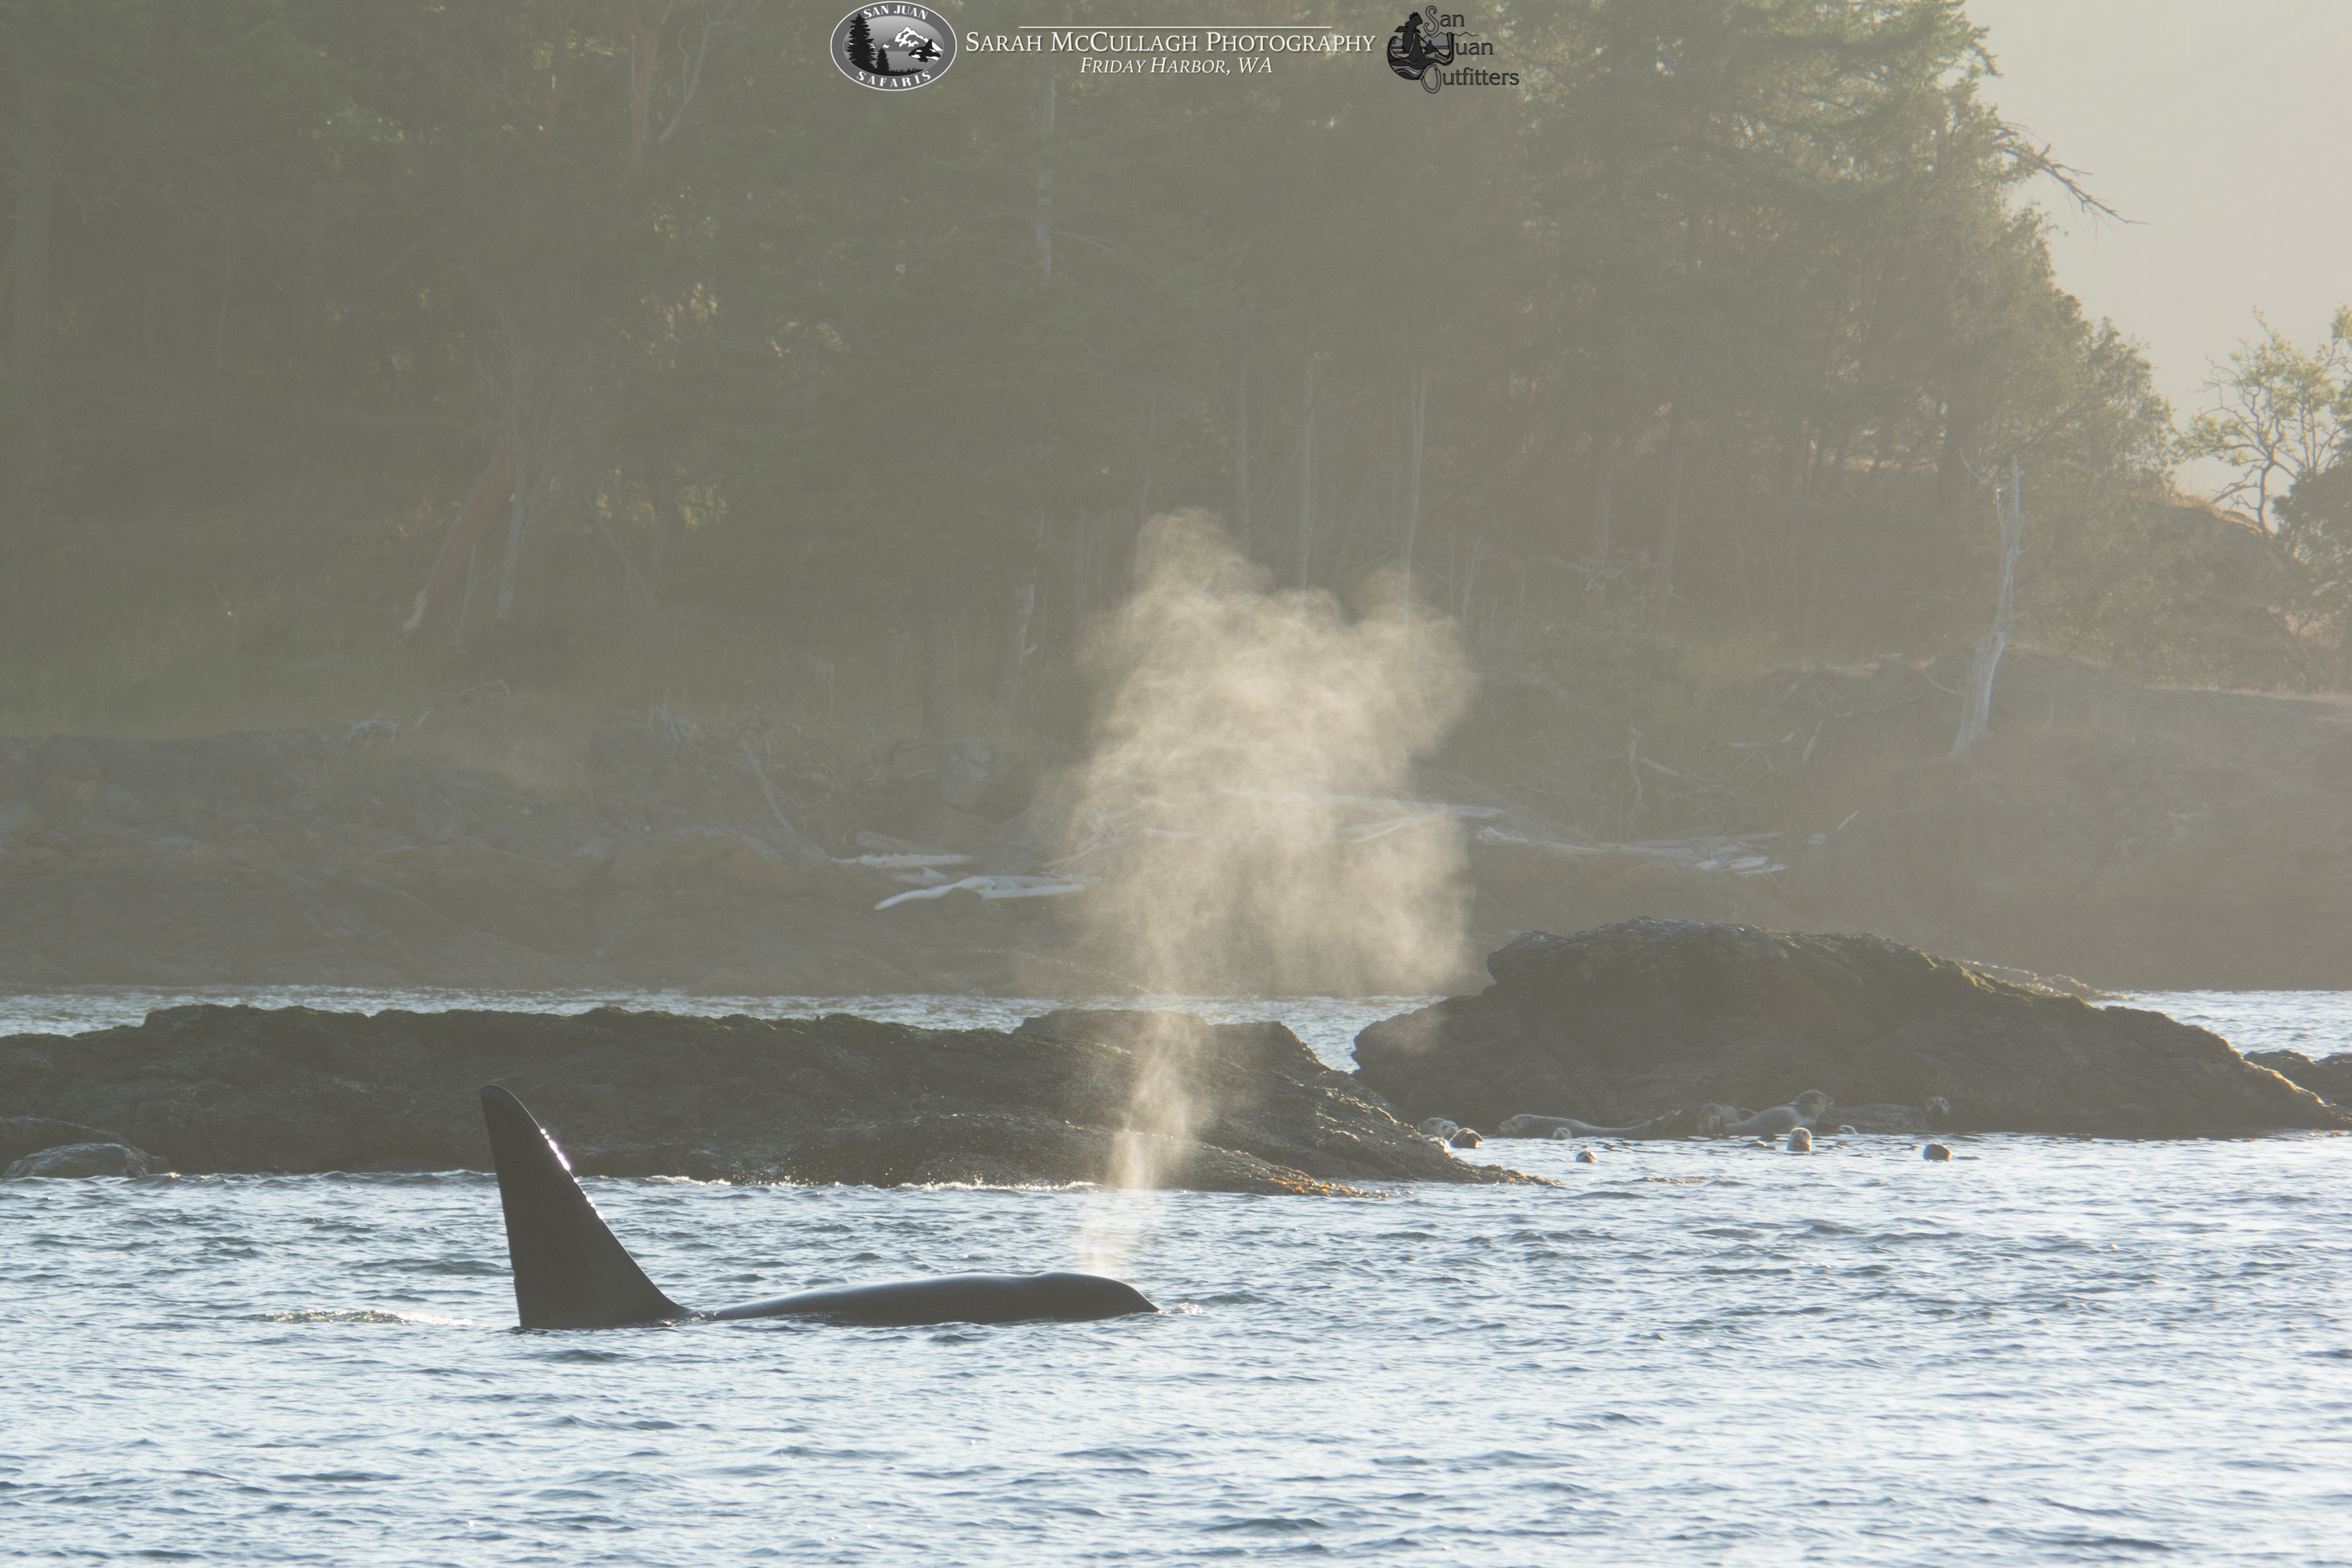 T049A1, a transient killer whale